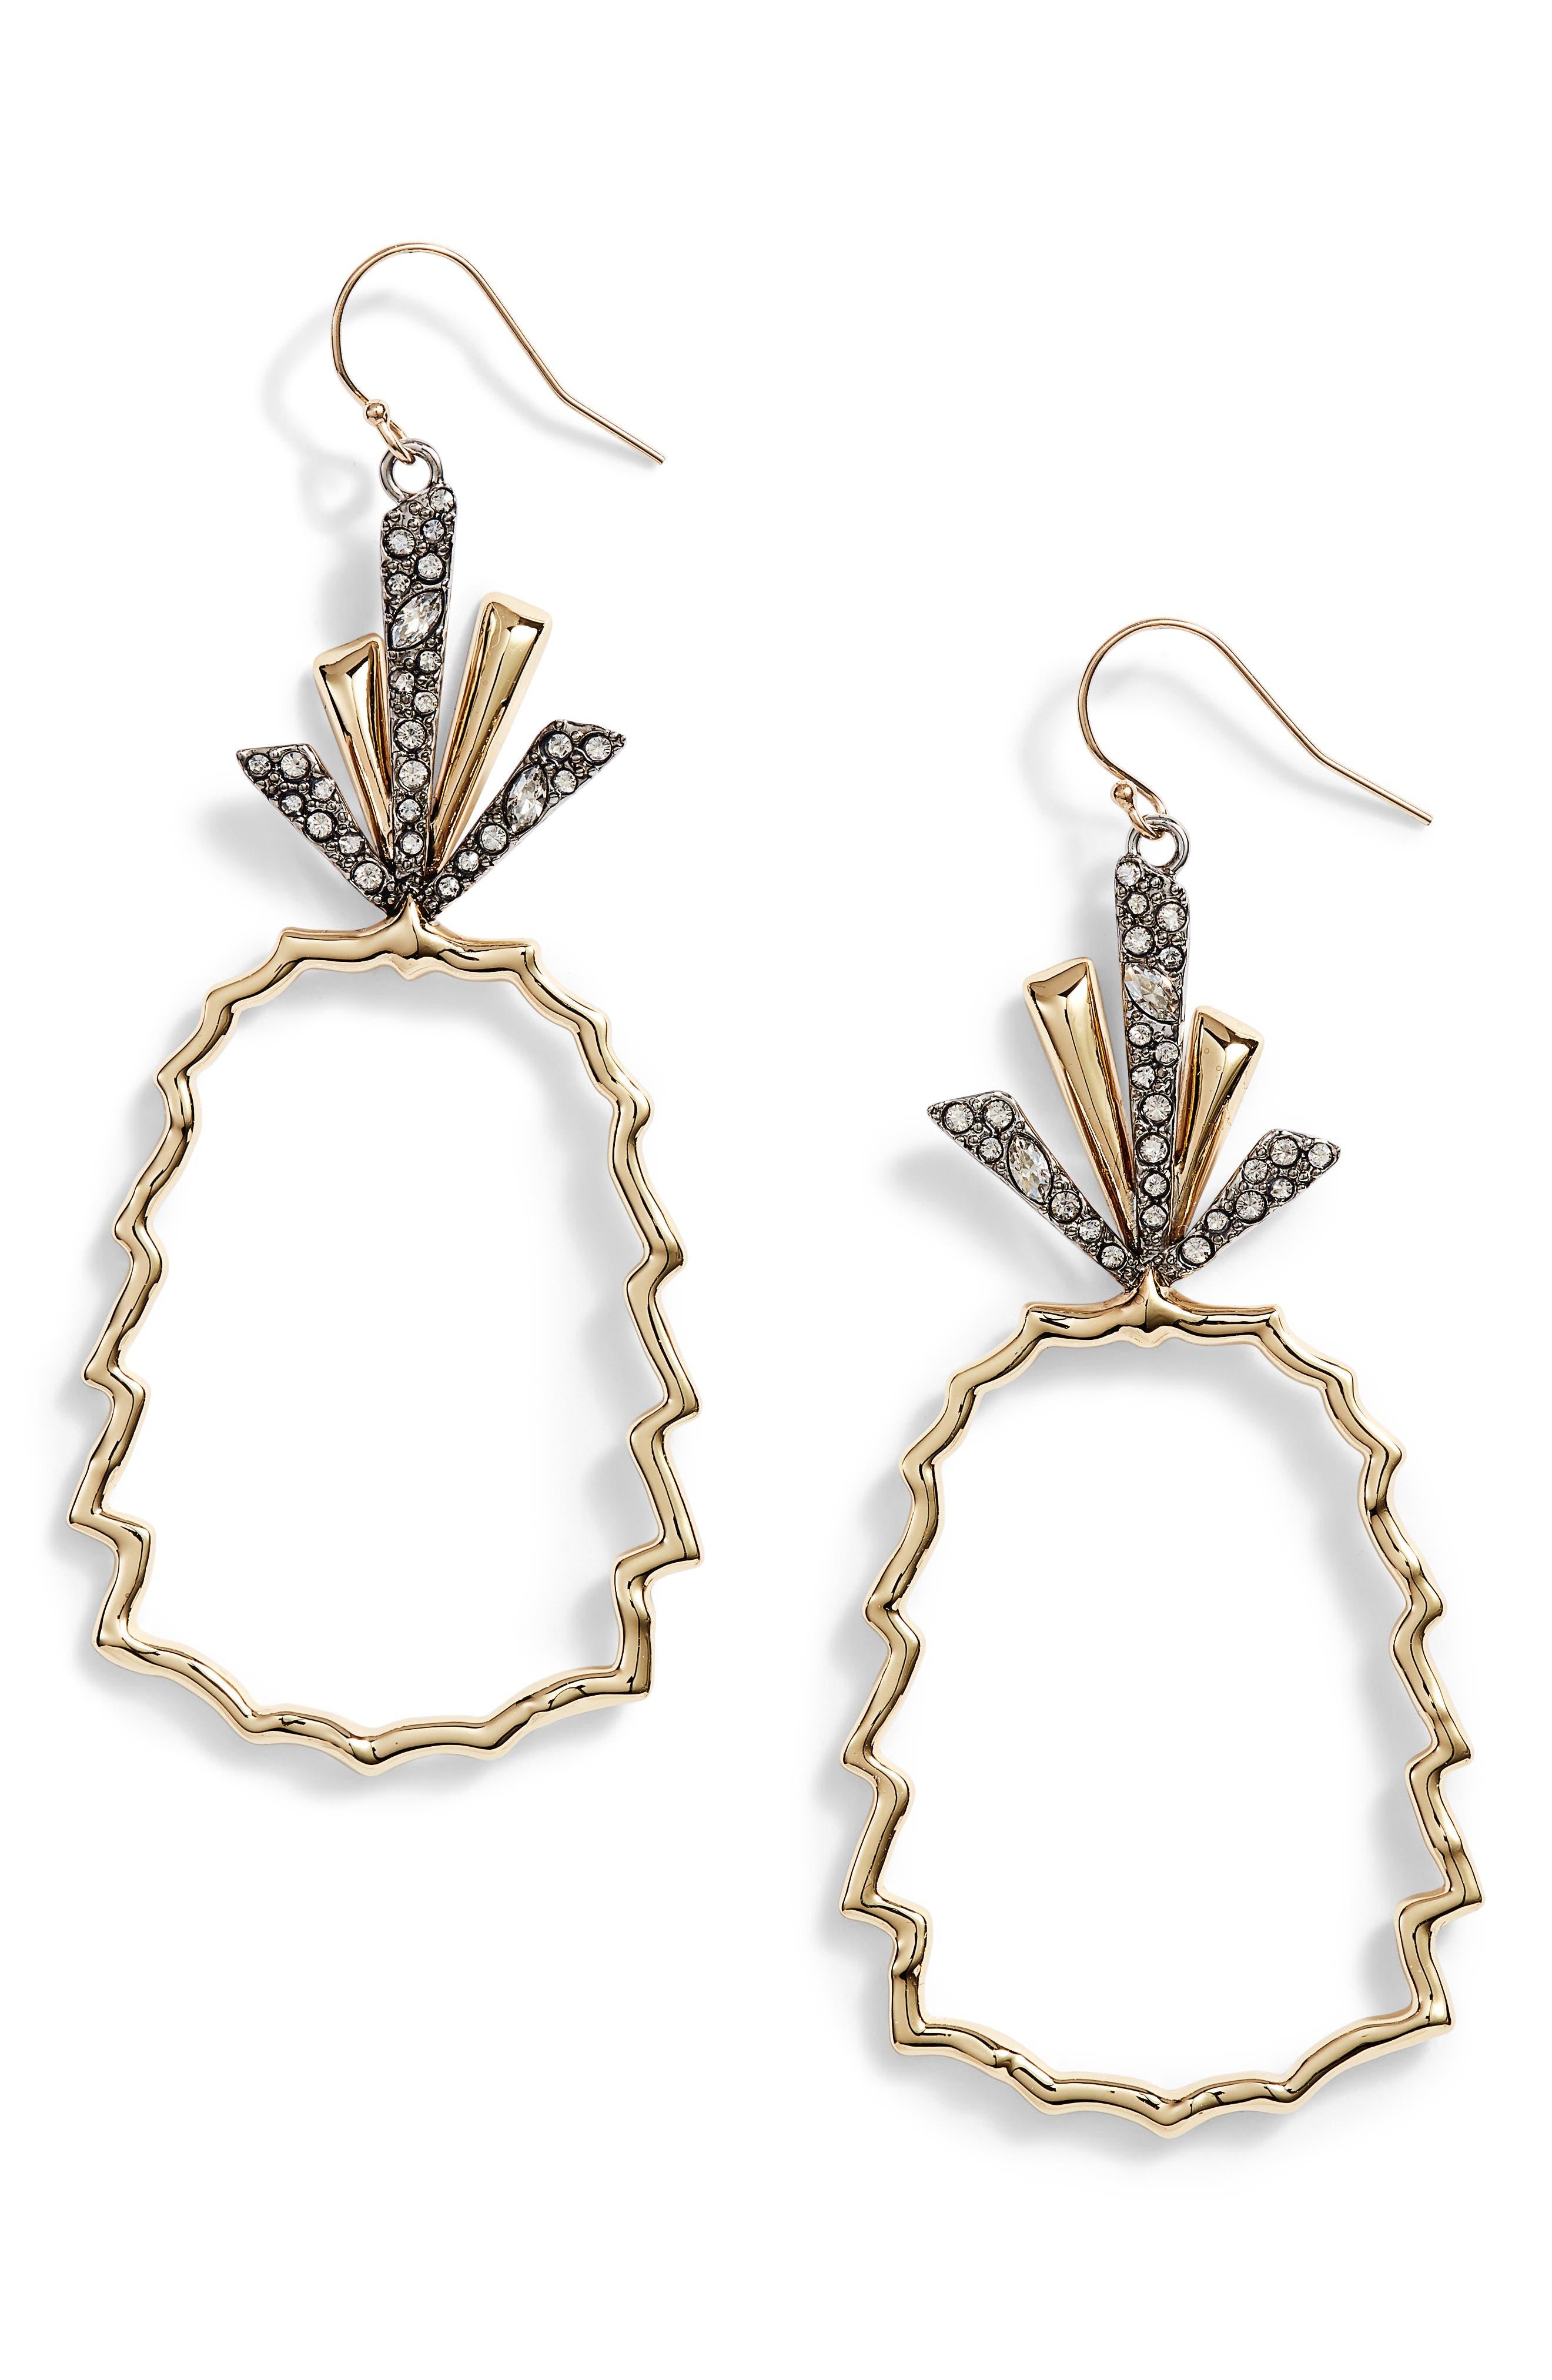 Crystal Leaf Pineapple Earrings,                         Main,                         color, GOLD